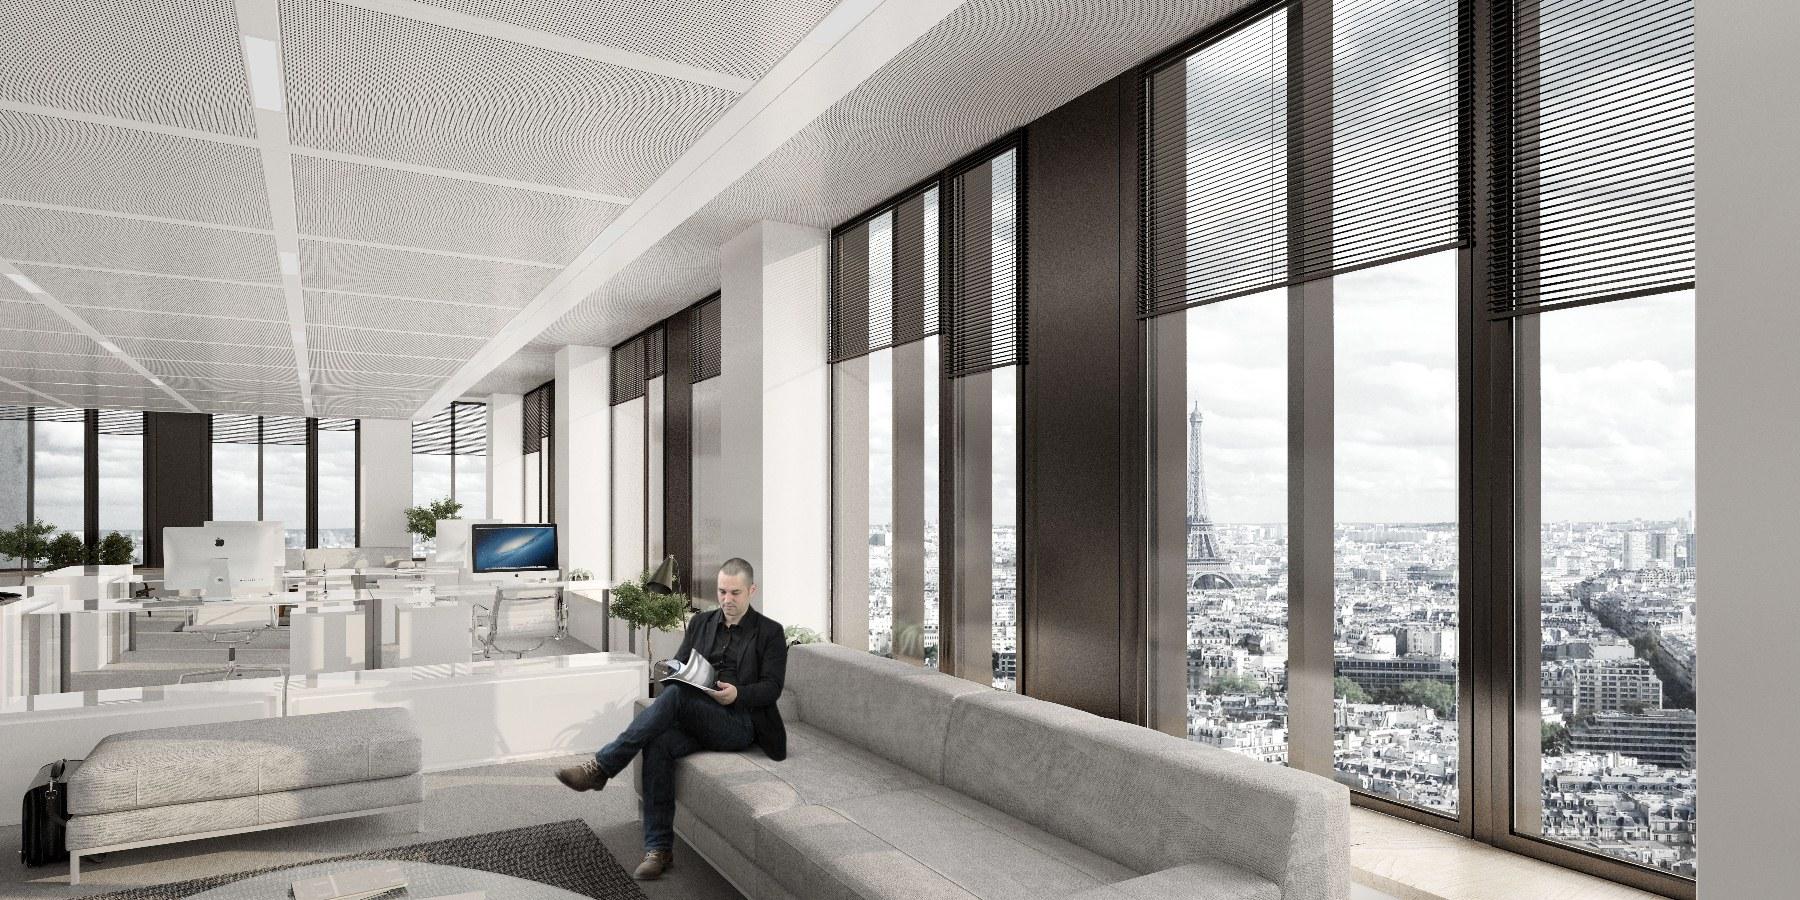 Visualizing architecture - commercial rendering 4 - MONOMO